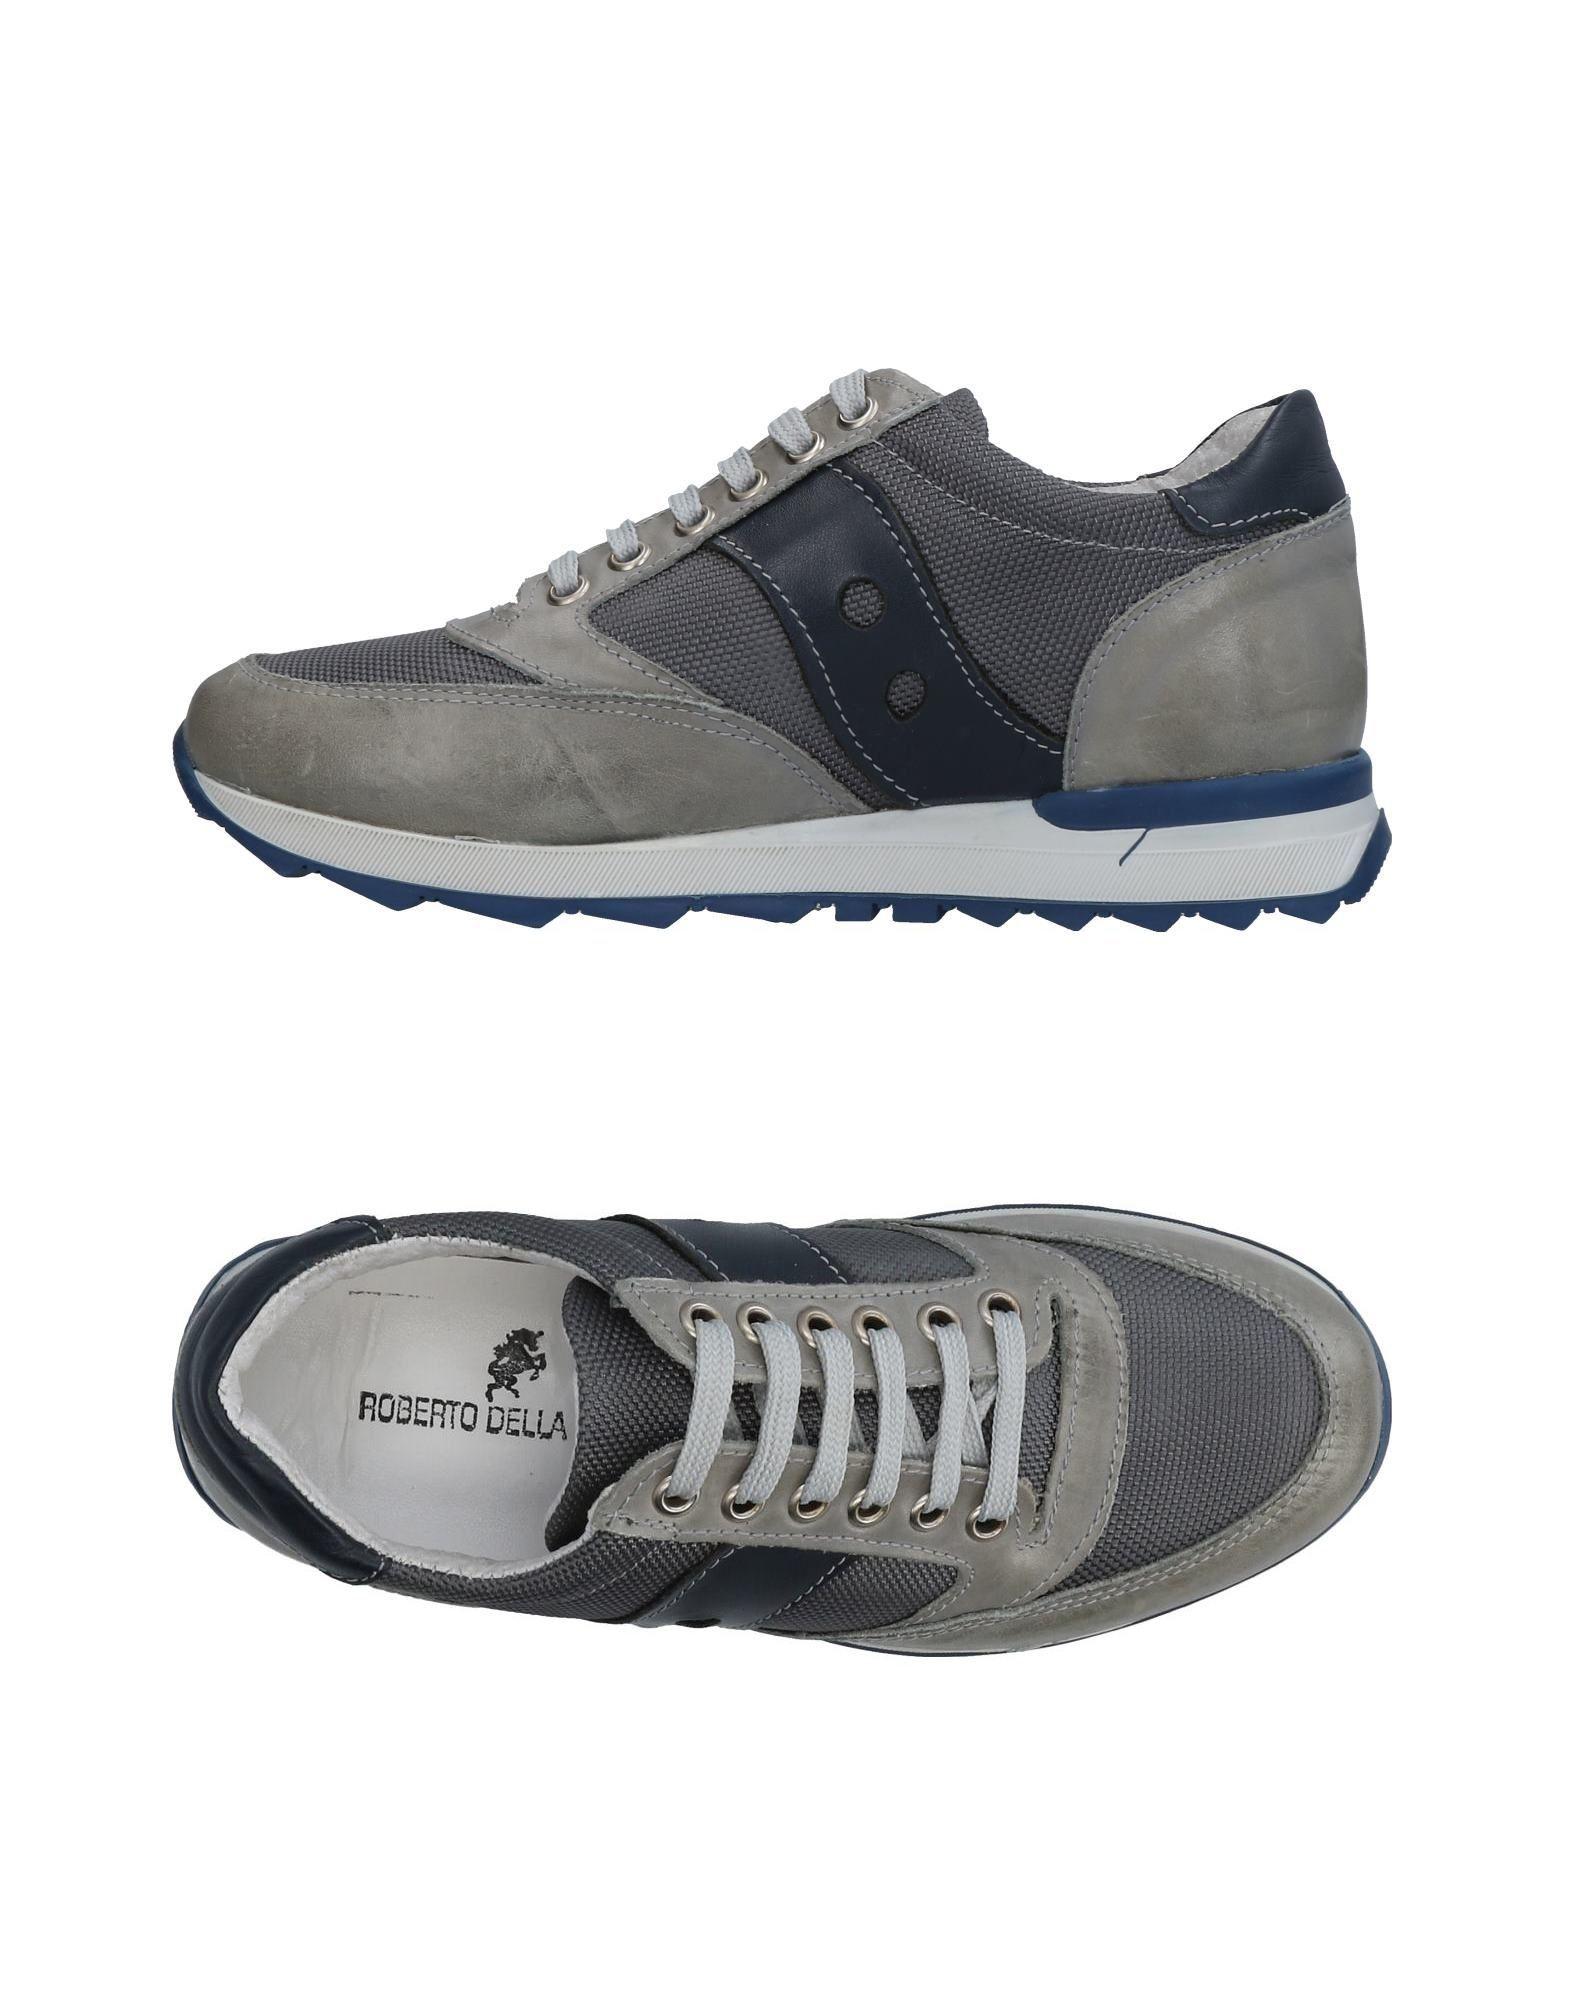 Roberto Della Croce Sneakers Damen  11437229EO